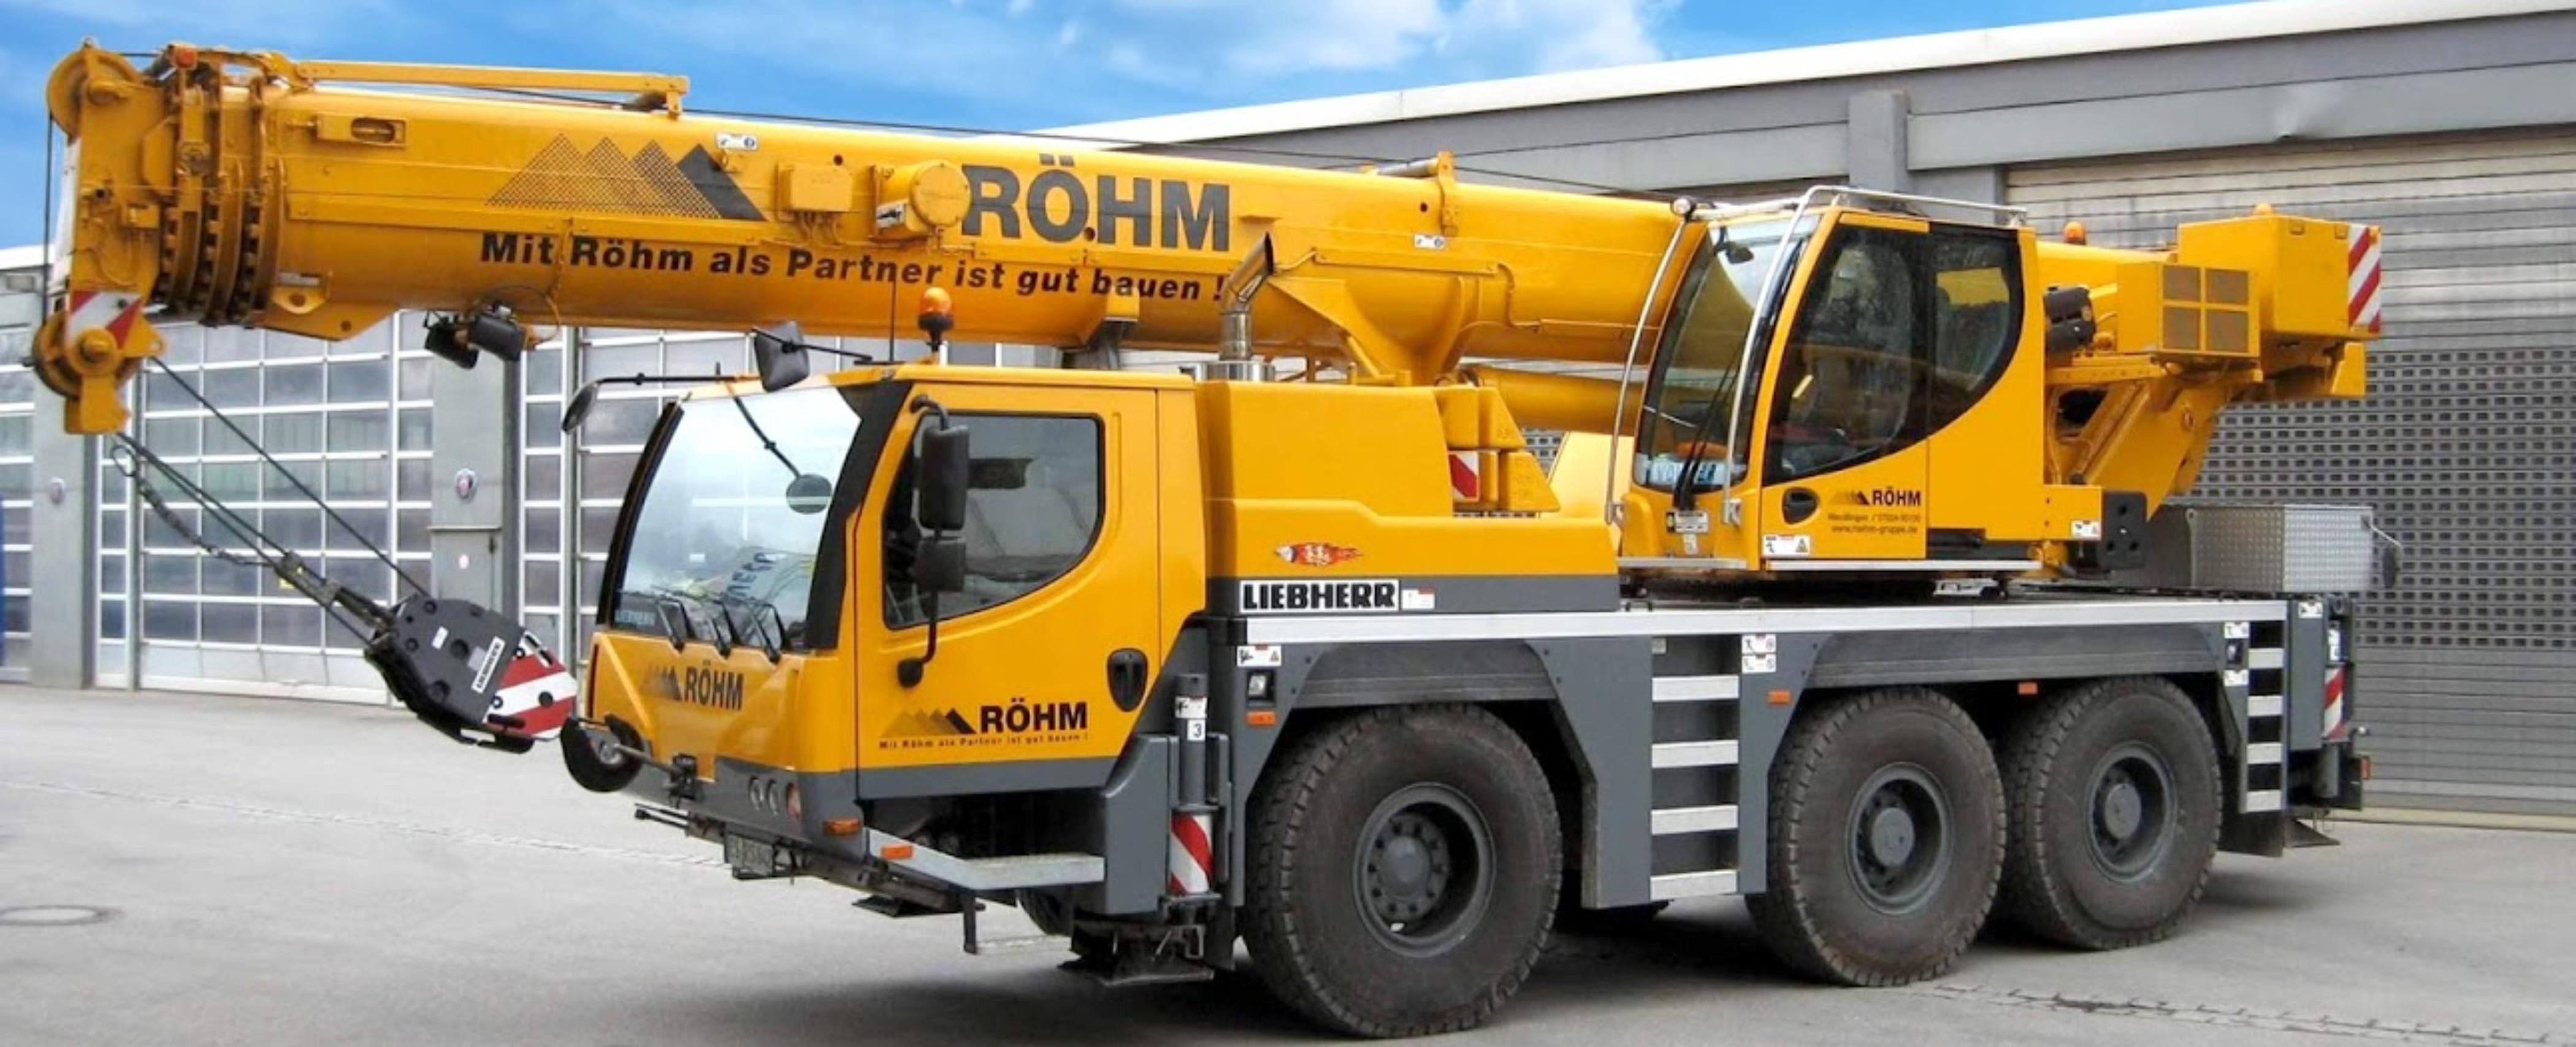 Röhm & Söhne Holding GmbH & Co. KG